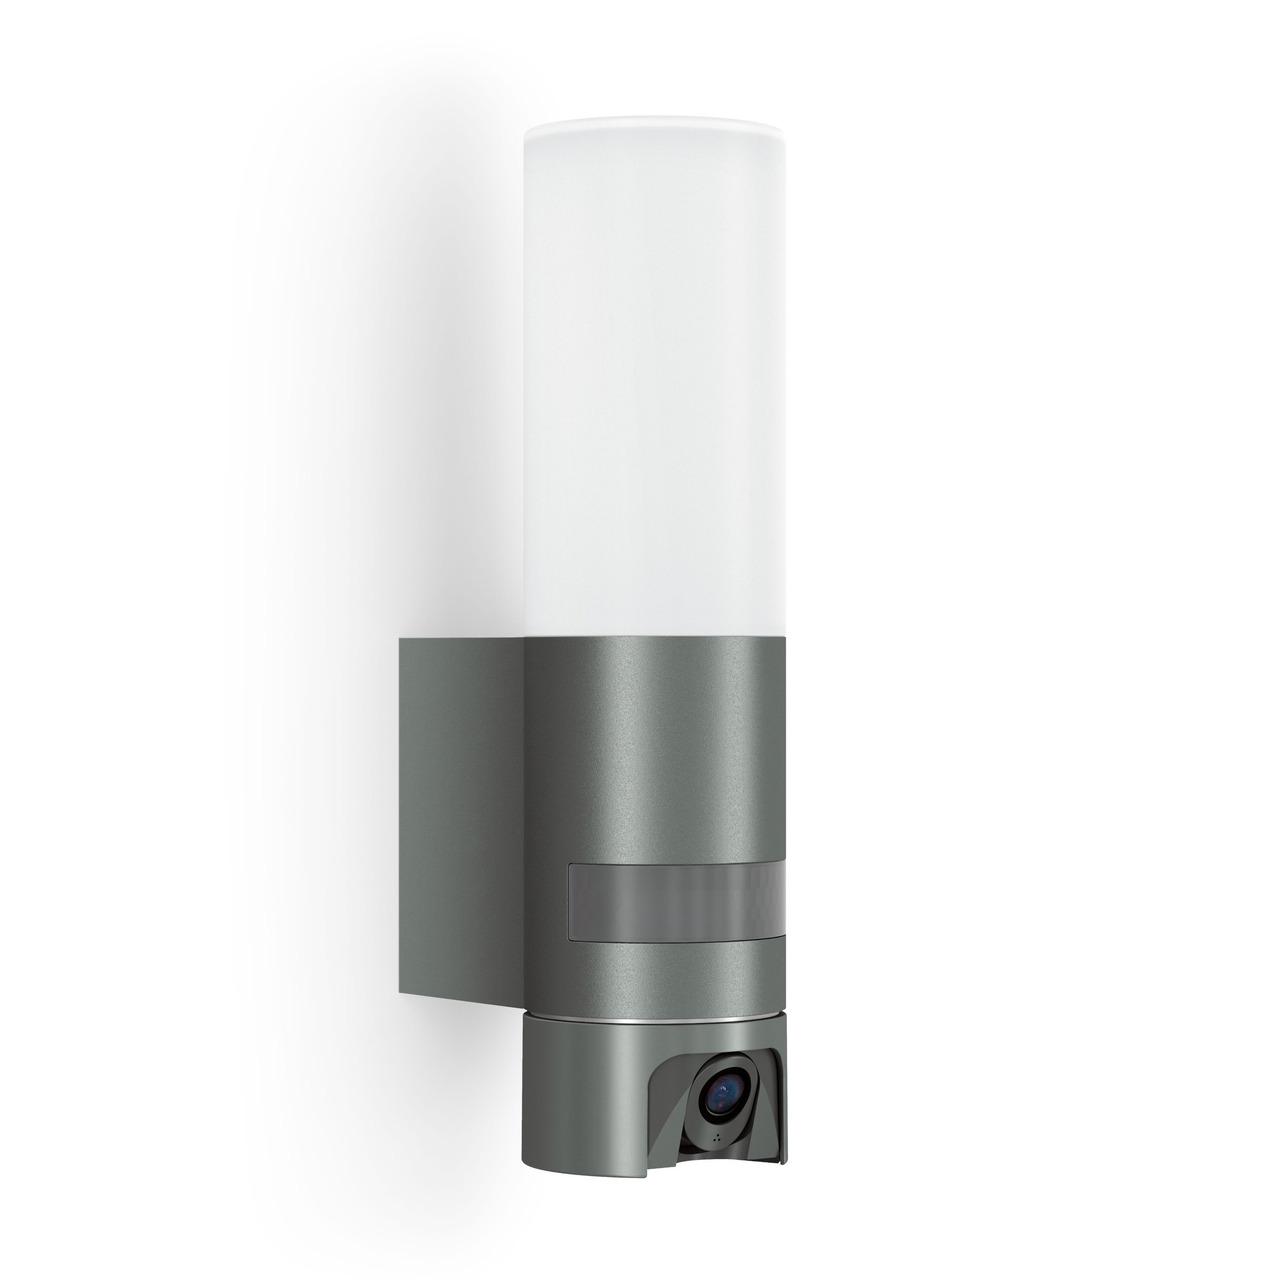 Steinel 13-5-W-LED-Wand-Kameraleuchte L 620 CAM- Full-HD Kamera (1080p)- App-Zugriff